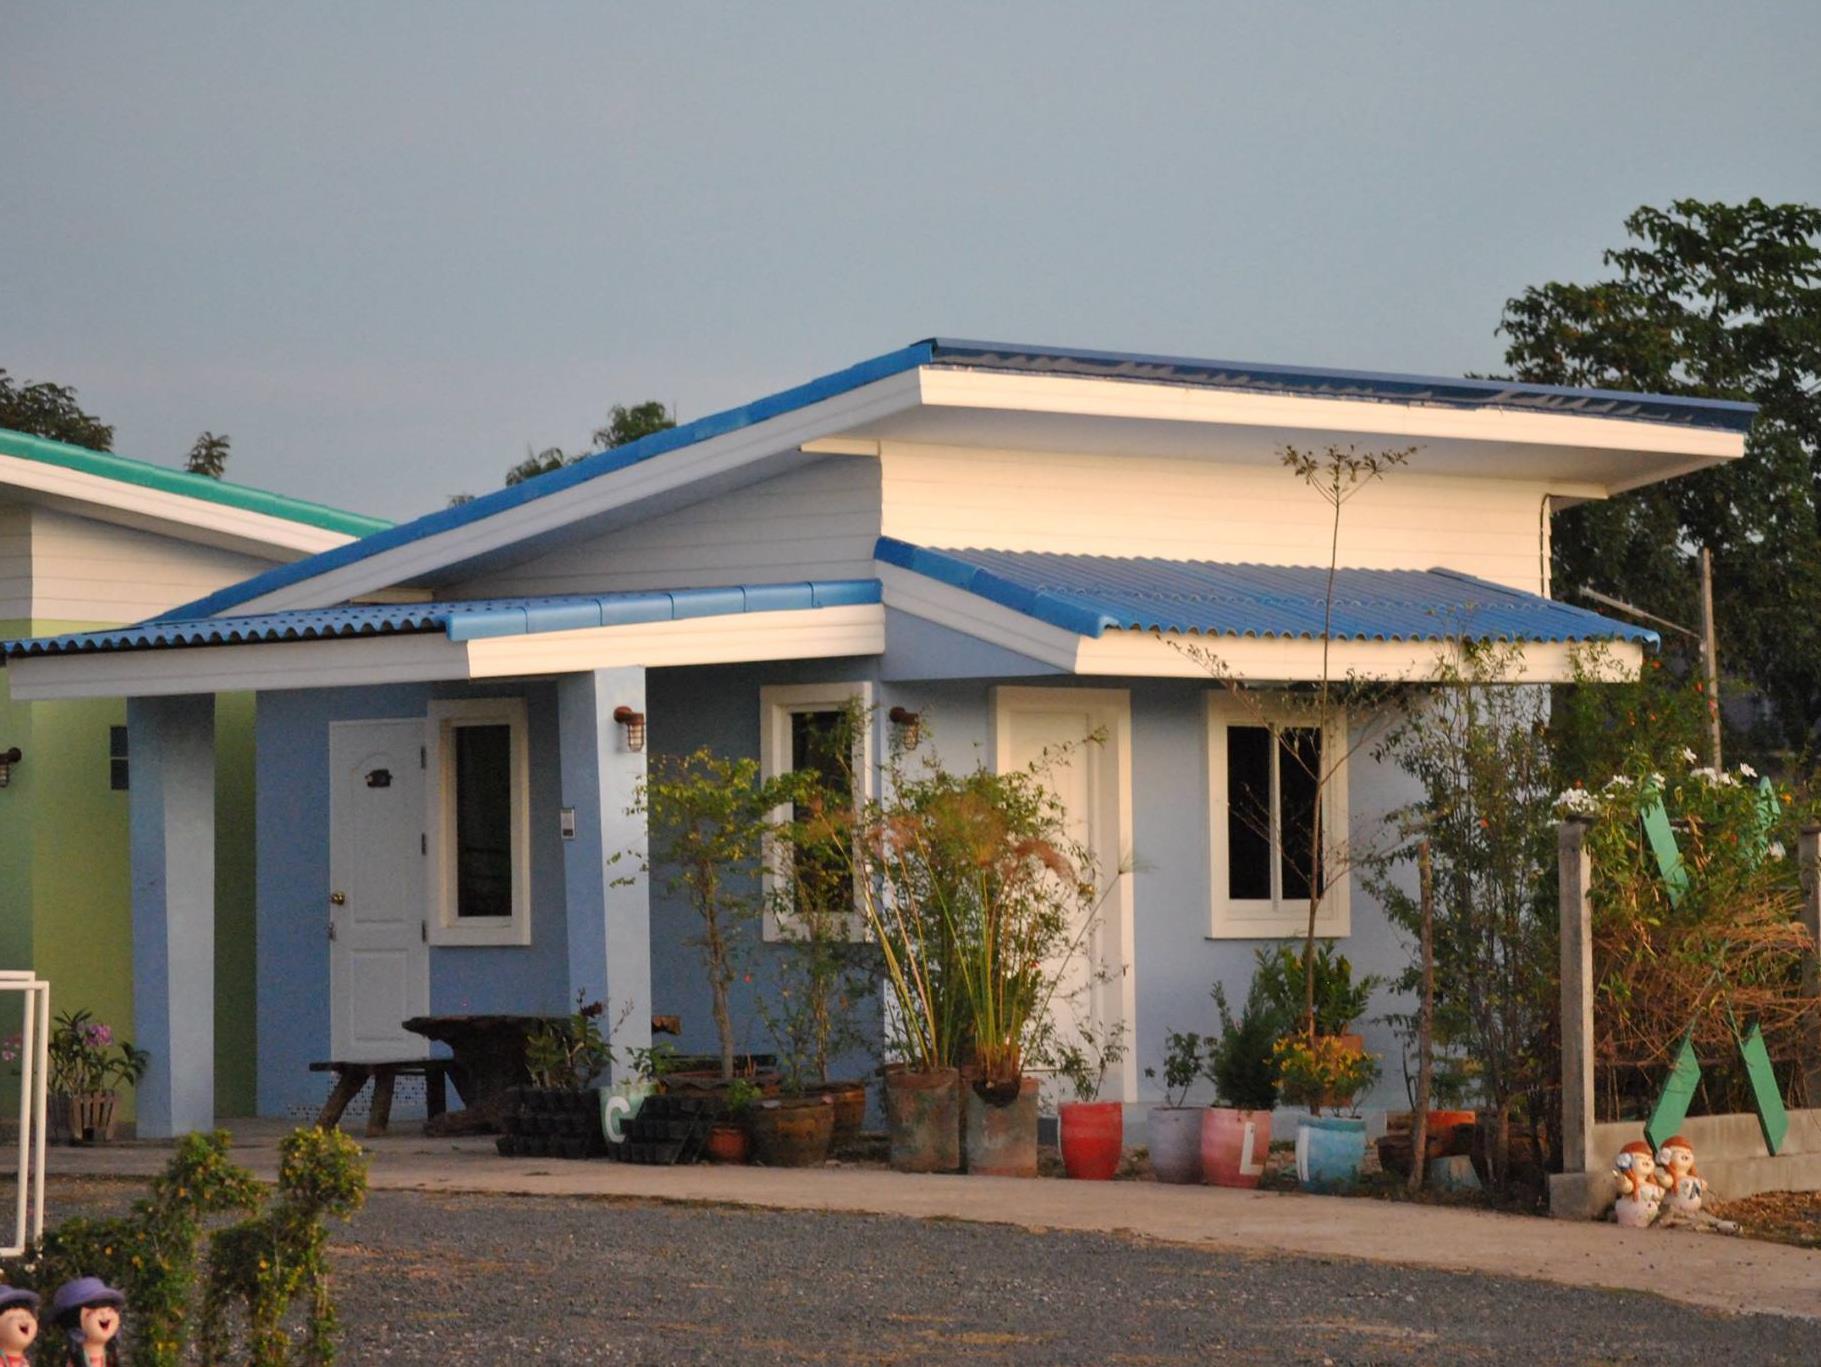 Resort Baan Fahsai Daosuay,รีสอร์ท บ้านฟ้าใสดาวสวย